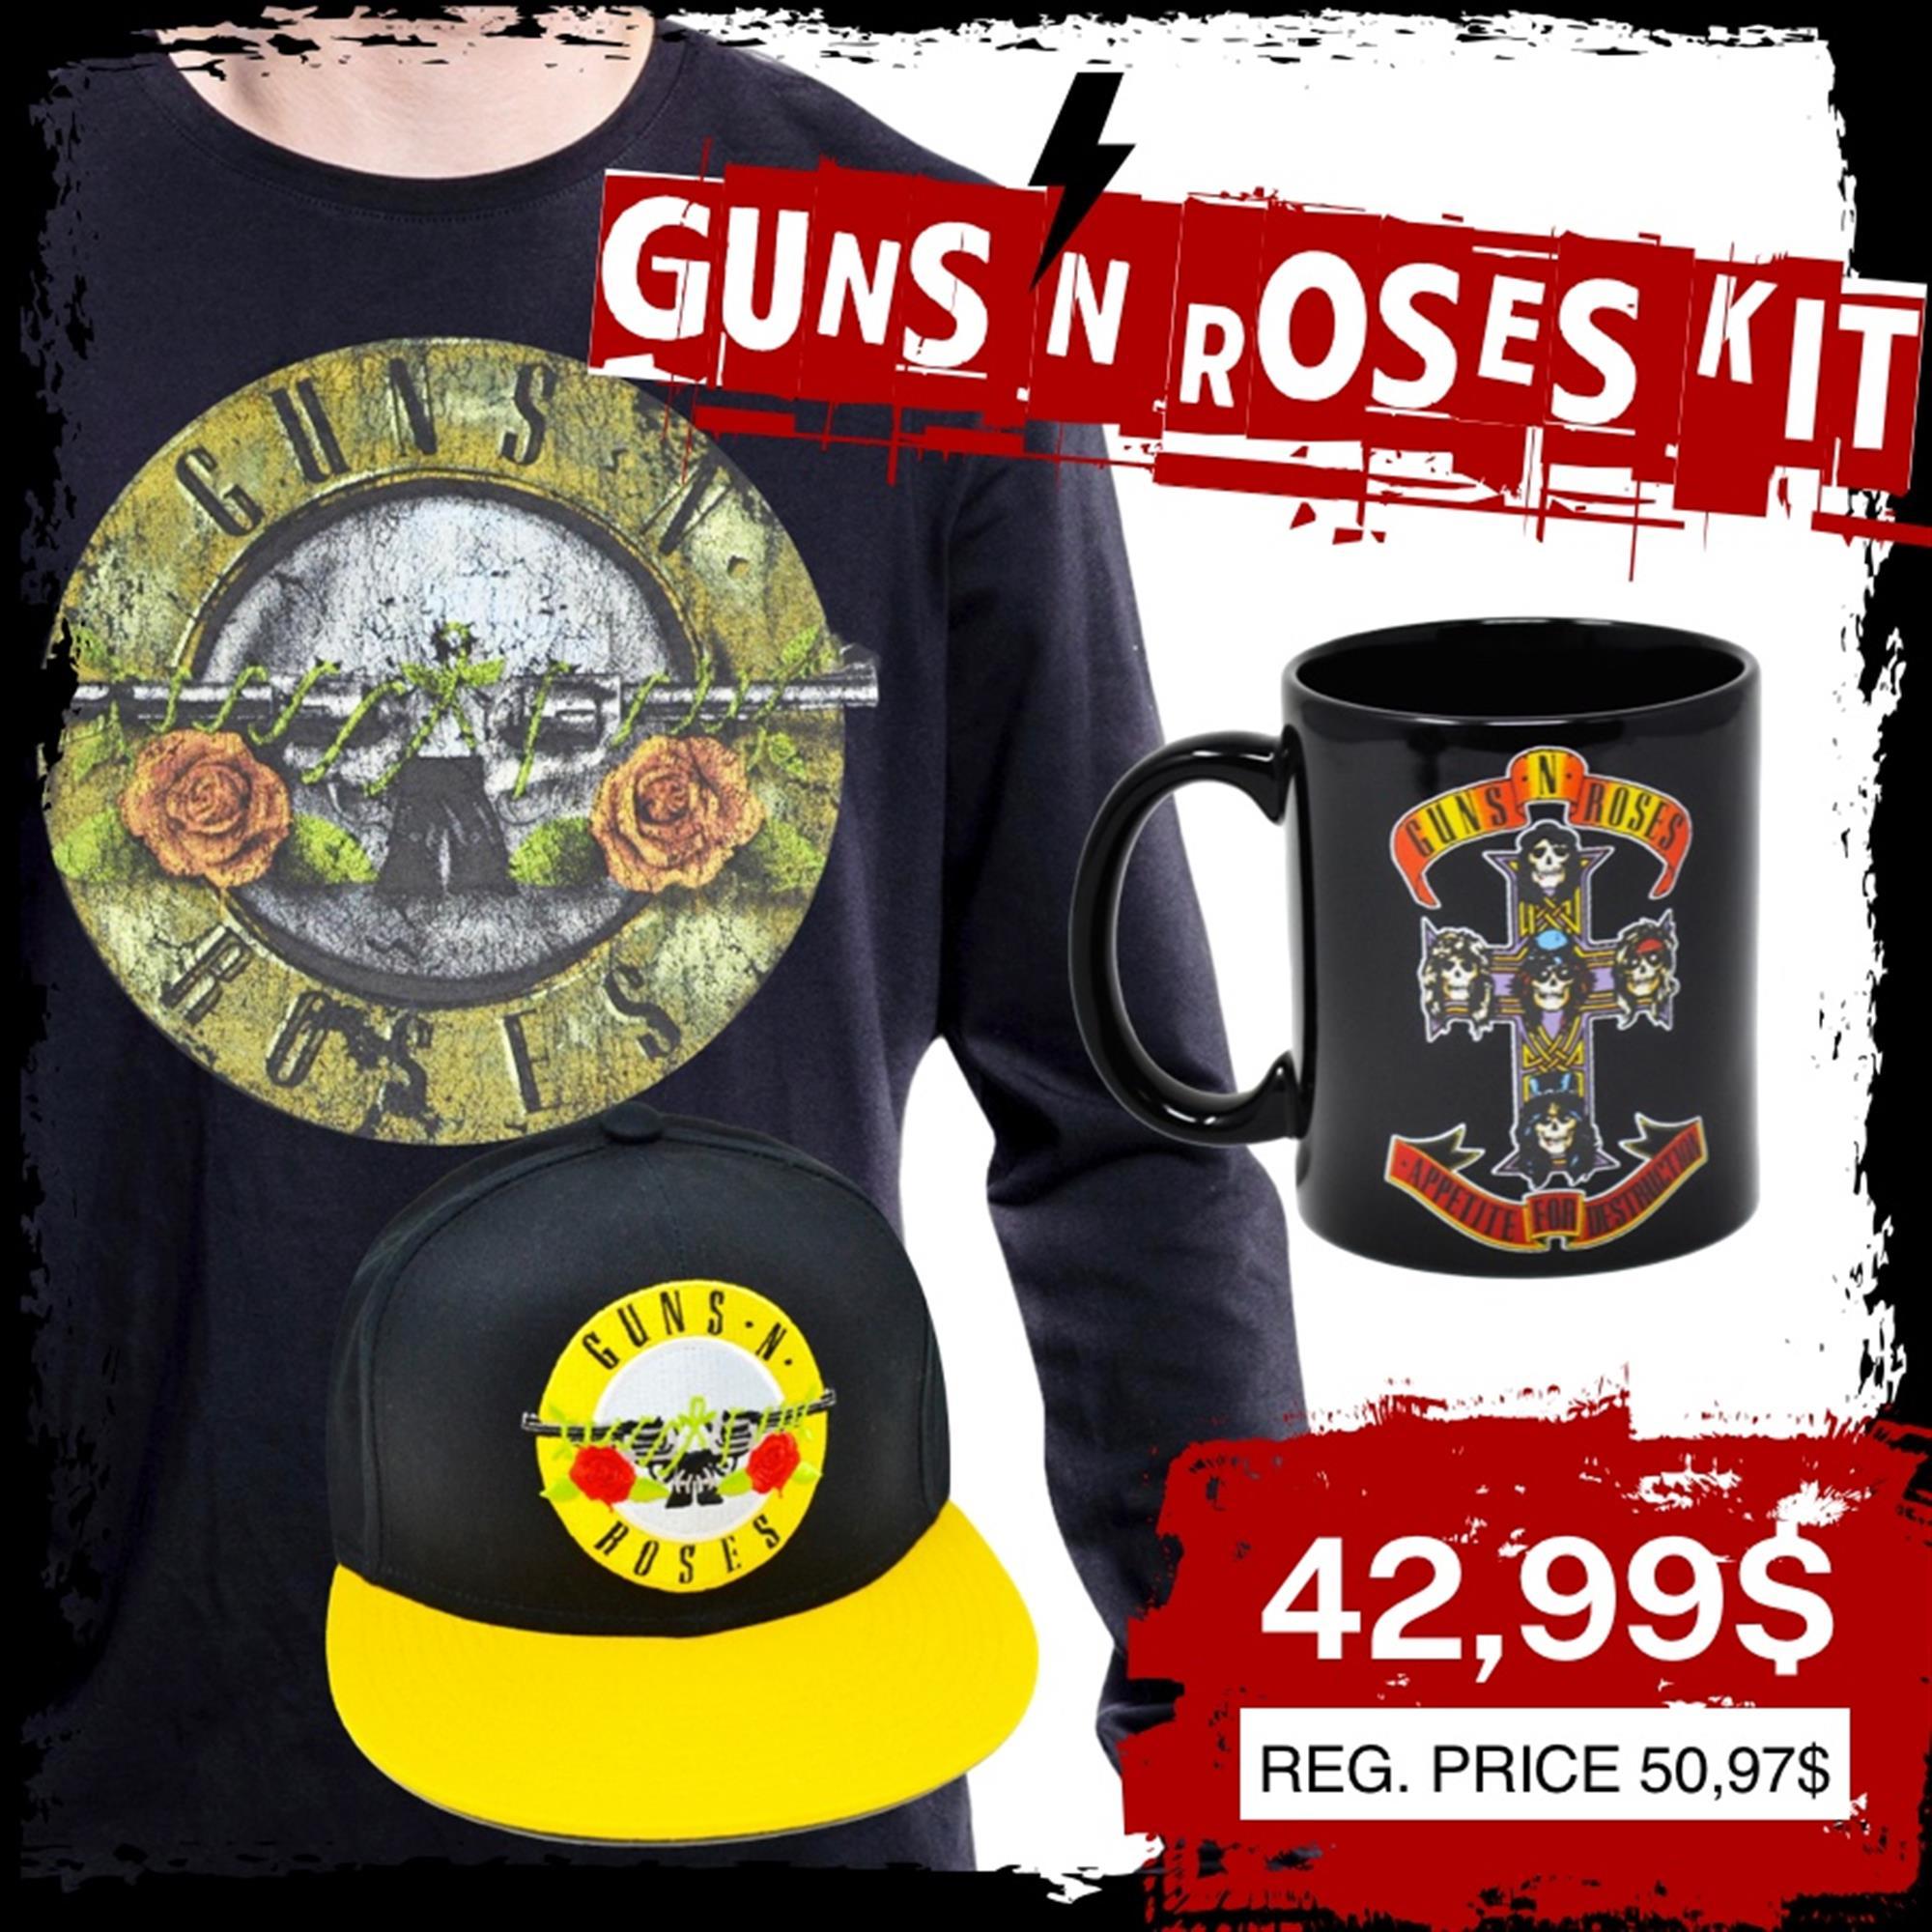 GUN 'N' ROSES KIT